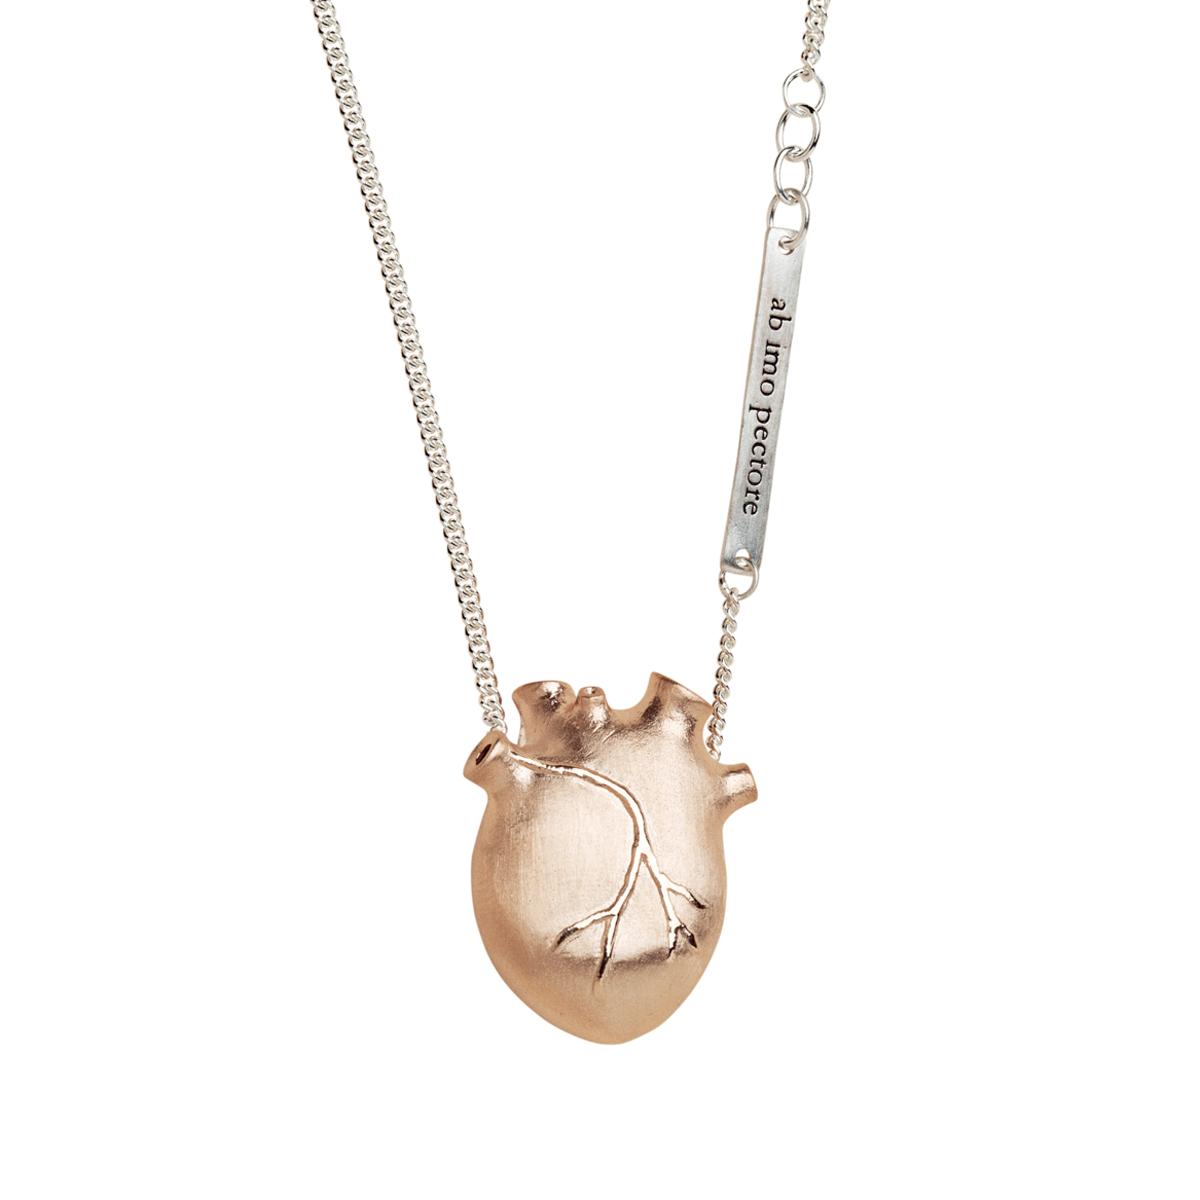 björg anatomic heart